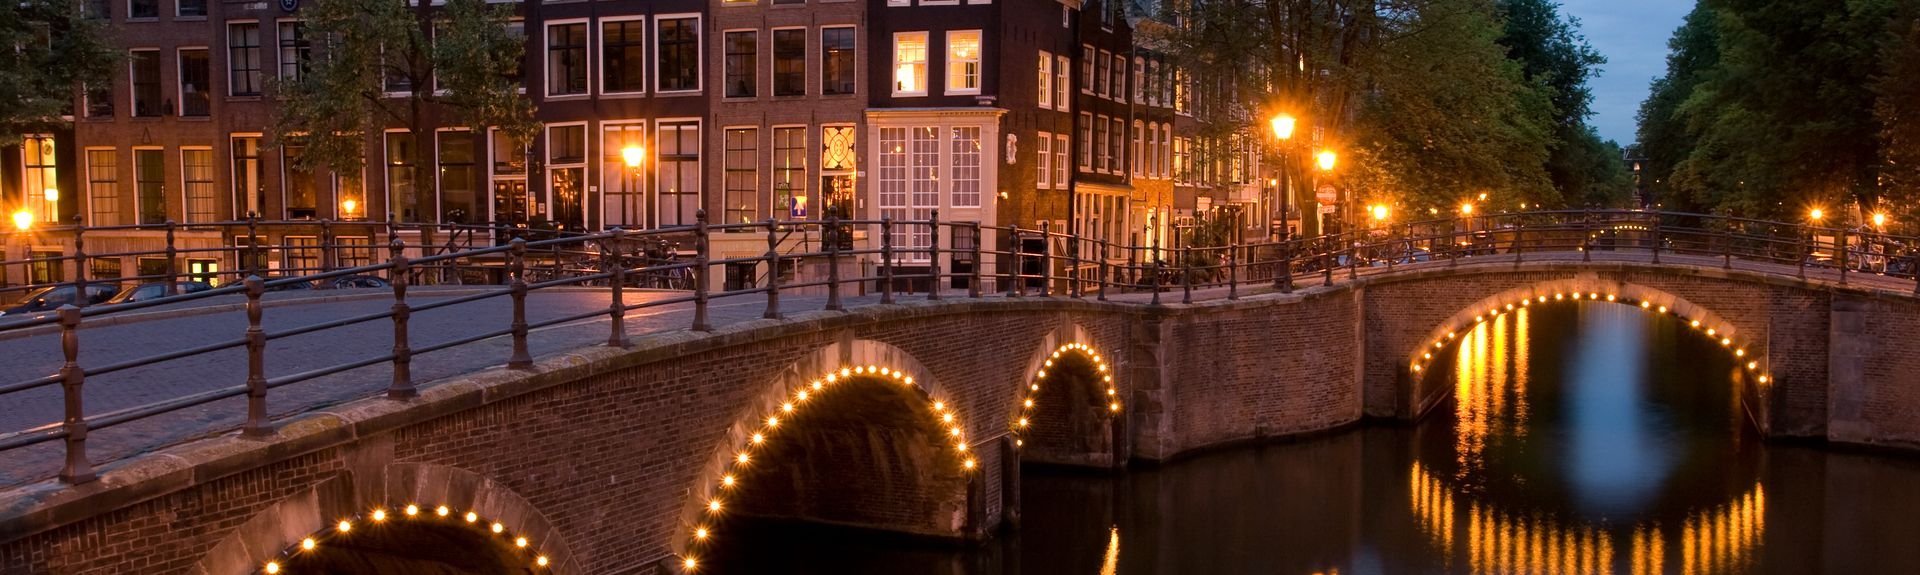 De Baarsjes, Ámsterdam, Holanda Septentrional, Países Bajos